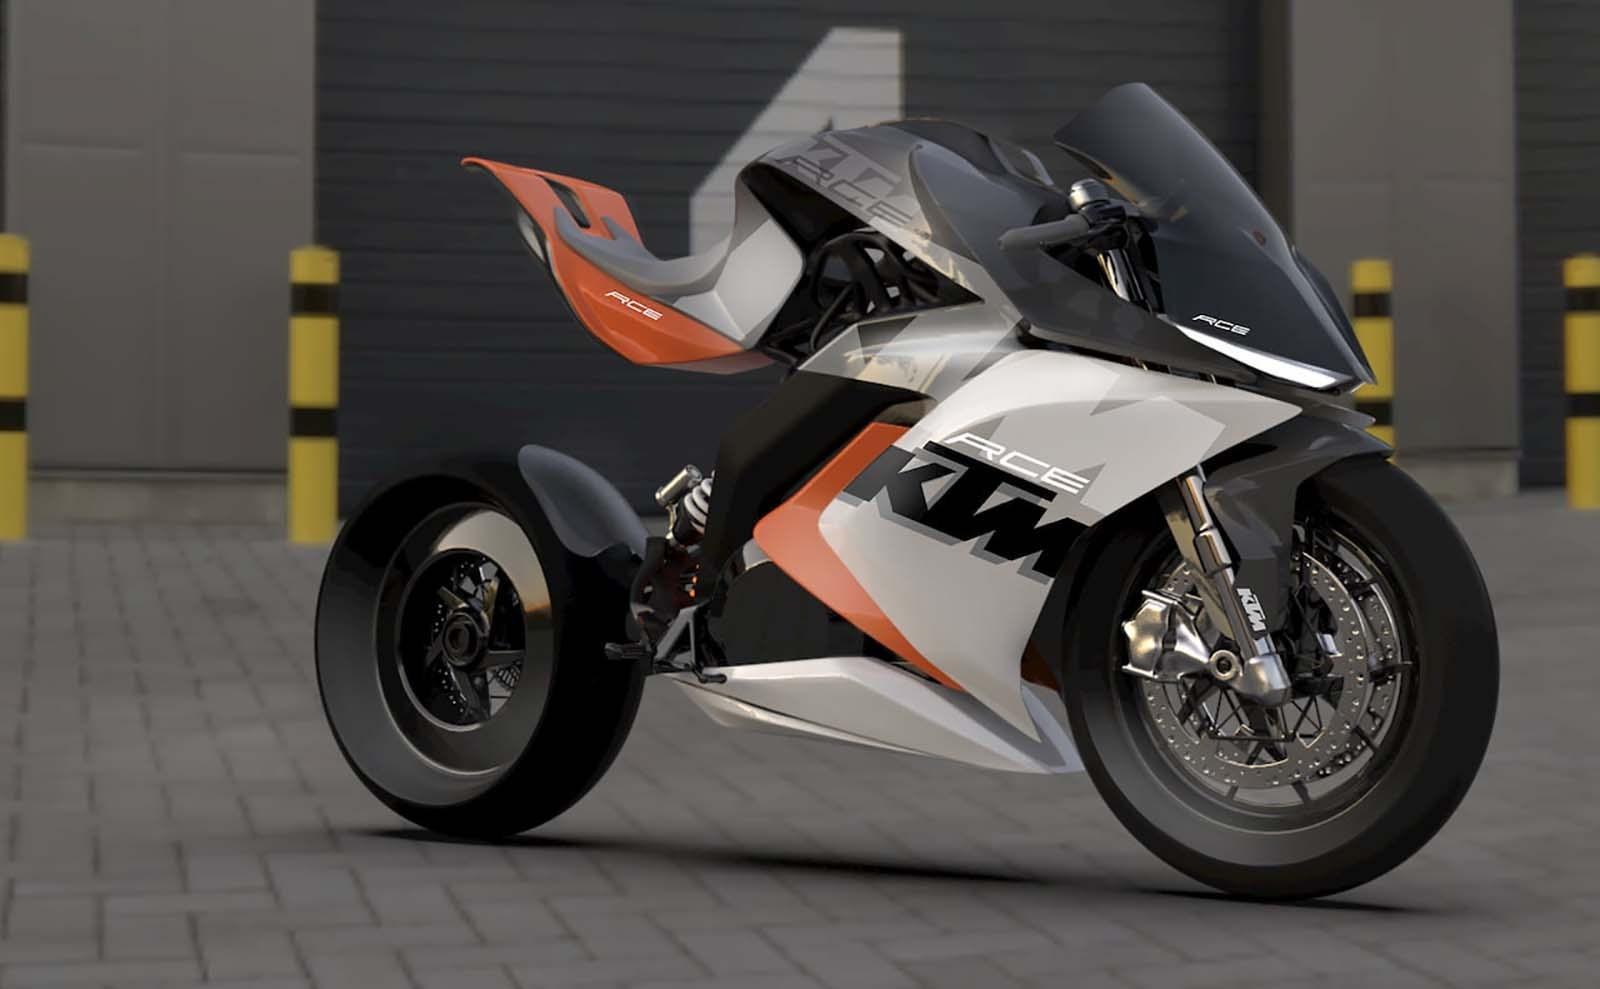 KTM の SS系電動バイクをイメージしたコンセプト_f0004270_20081098.jpg